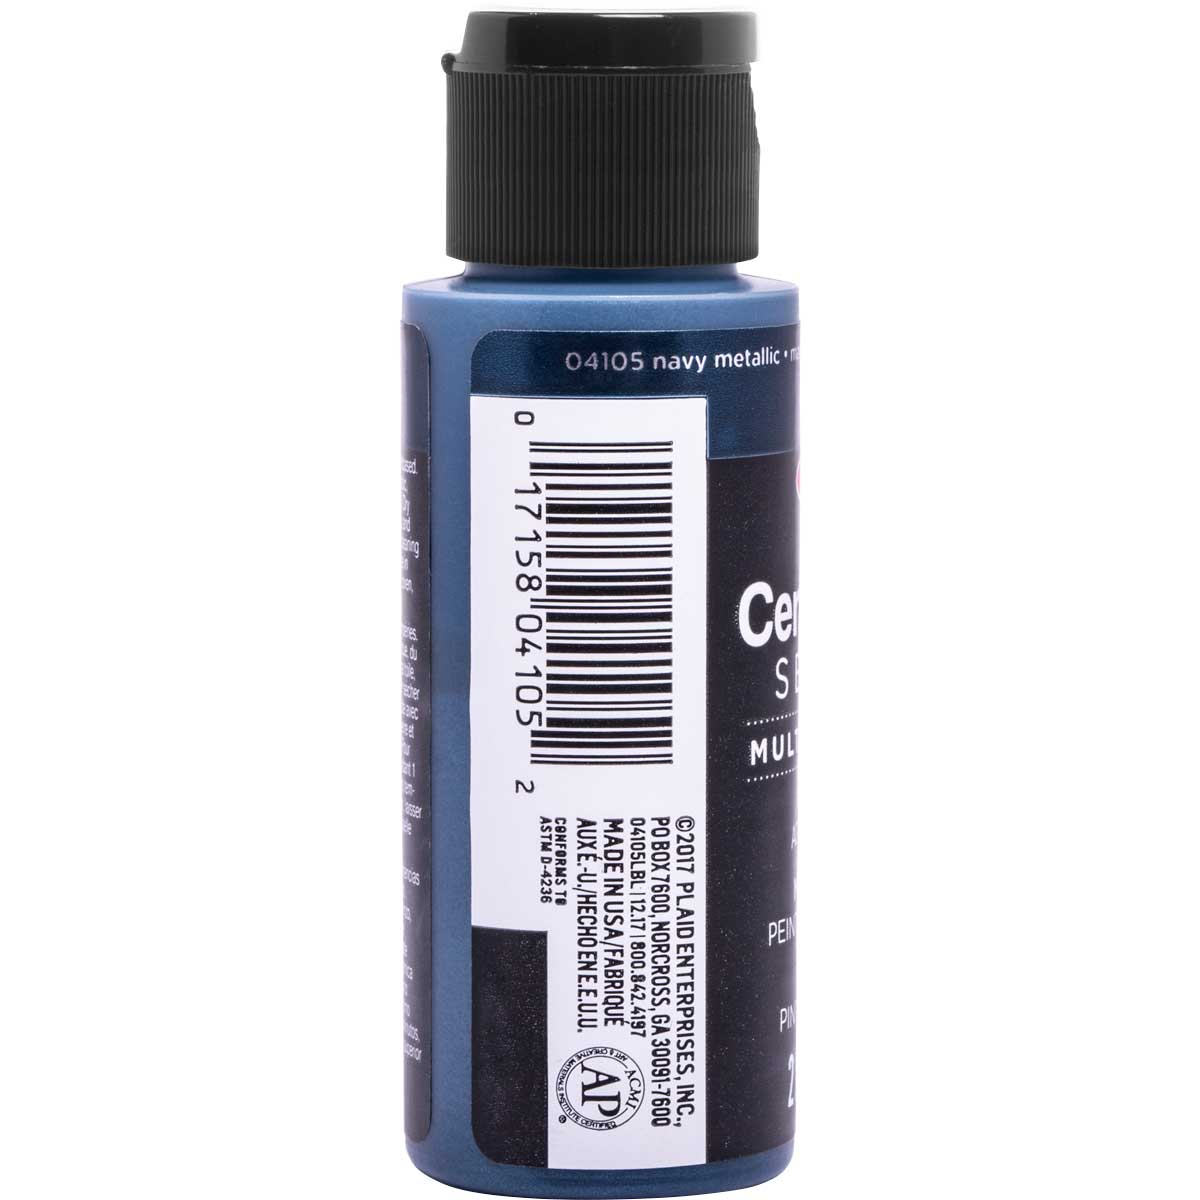 Delta Ceramcoat ® Select Multi-Surface Acrylic Paint - Metallic - Navy, 2 oz. - 04105